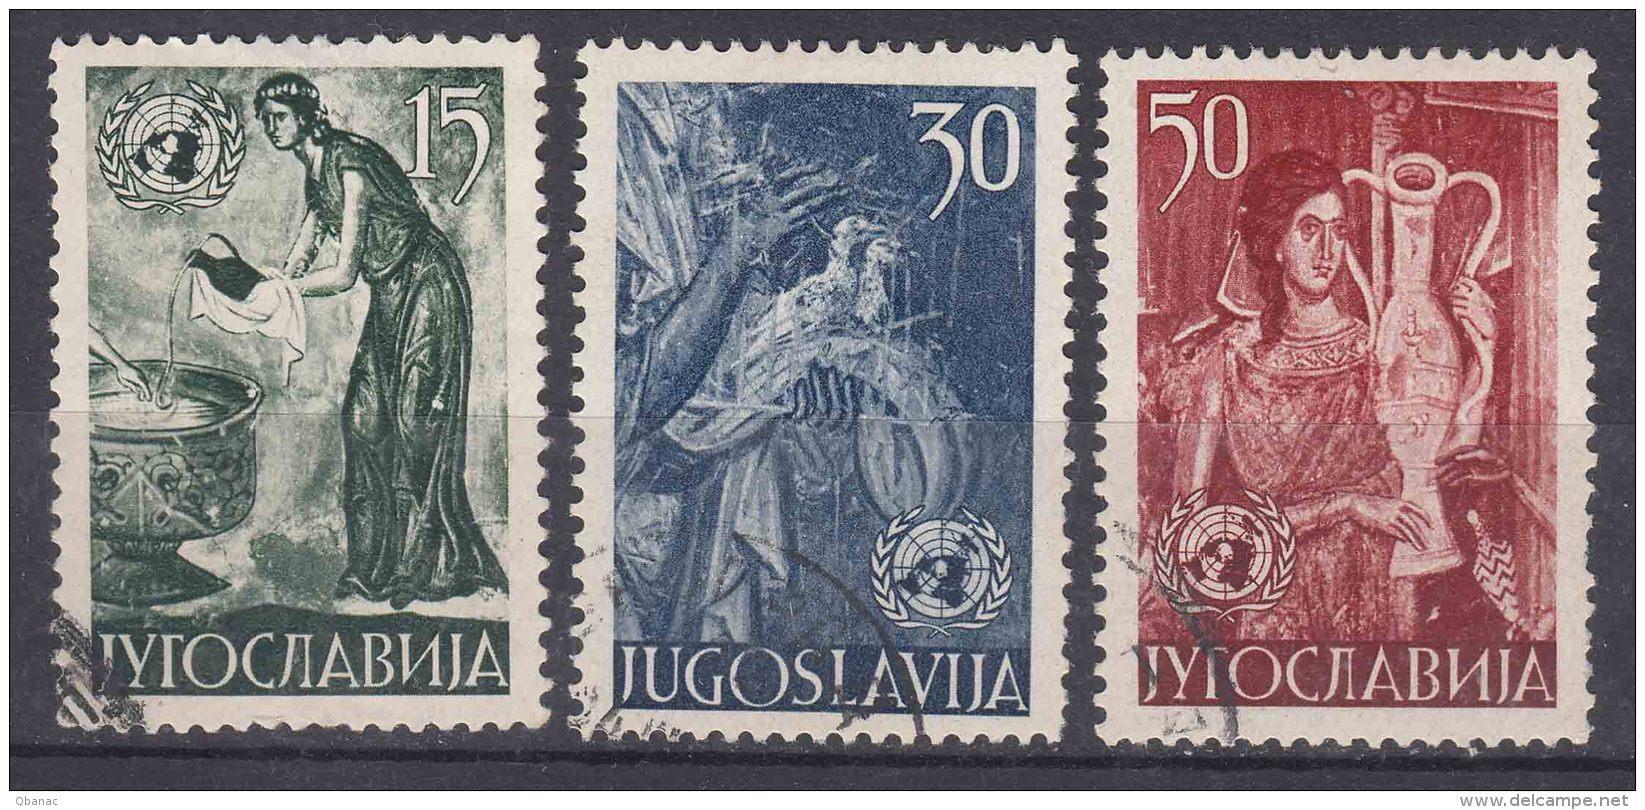 Yugoslavia Republic Art 1953 Mi#714-716 Used - 1945-1992 Socialistische Federale Republiek Joegoslavië